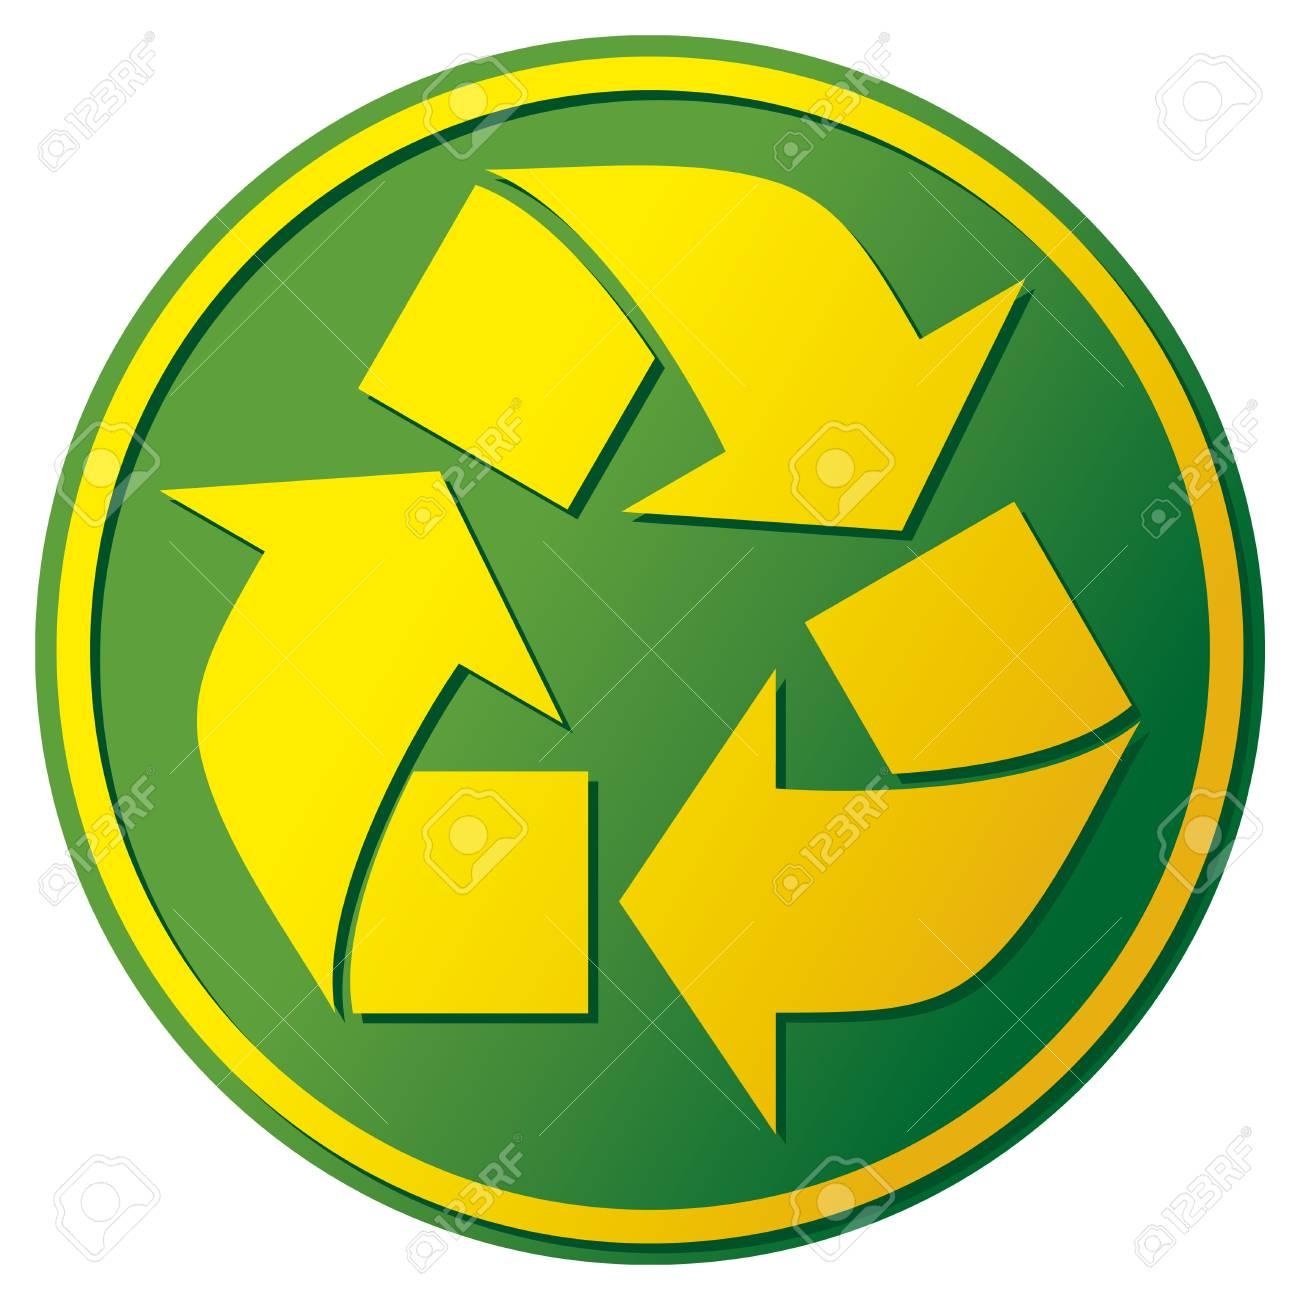 recycle symbol Stock Vector - 19317084